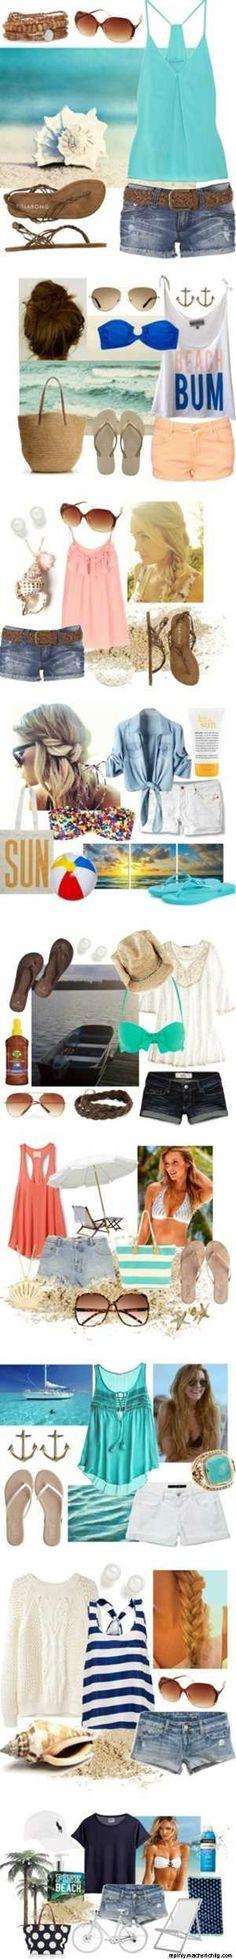 Sally Lee by the Sea Coastal Lifestyle Blog: Satur